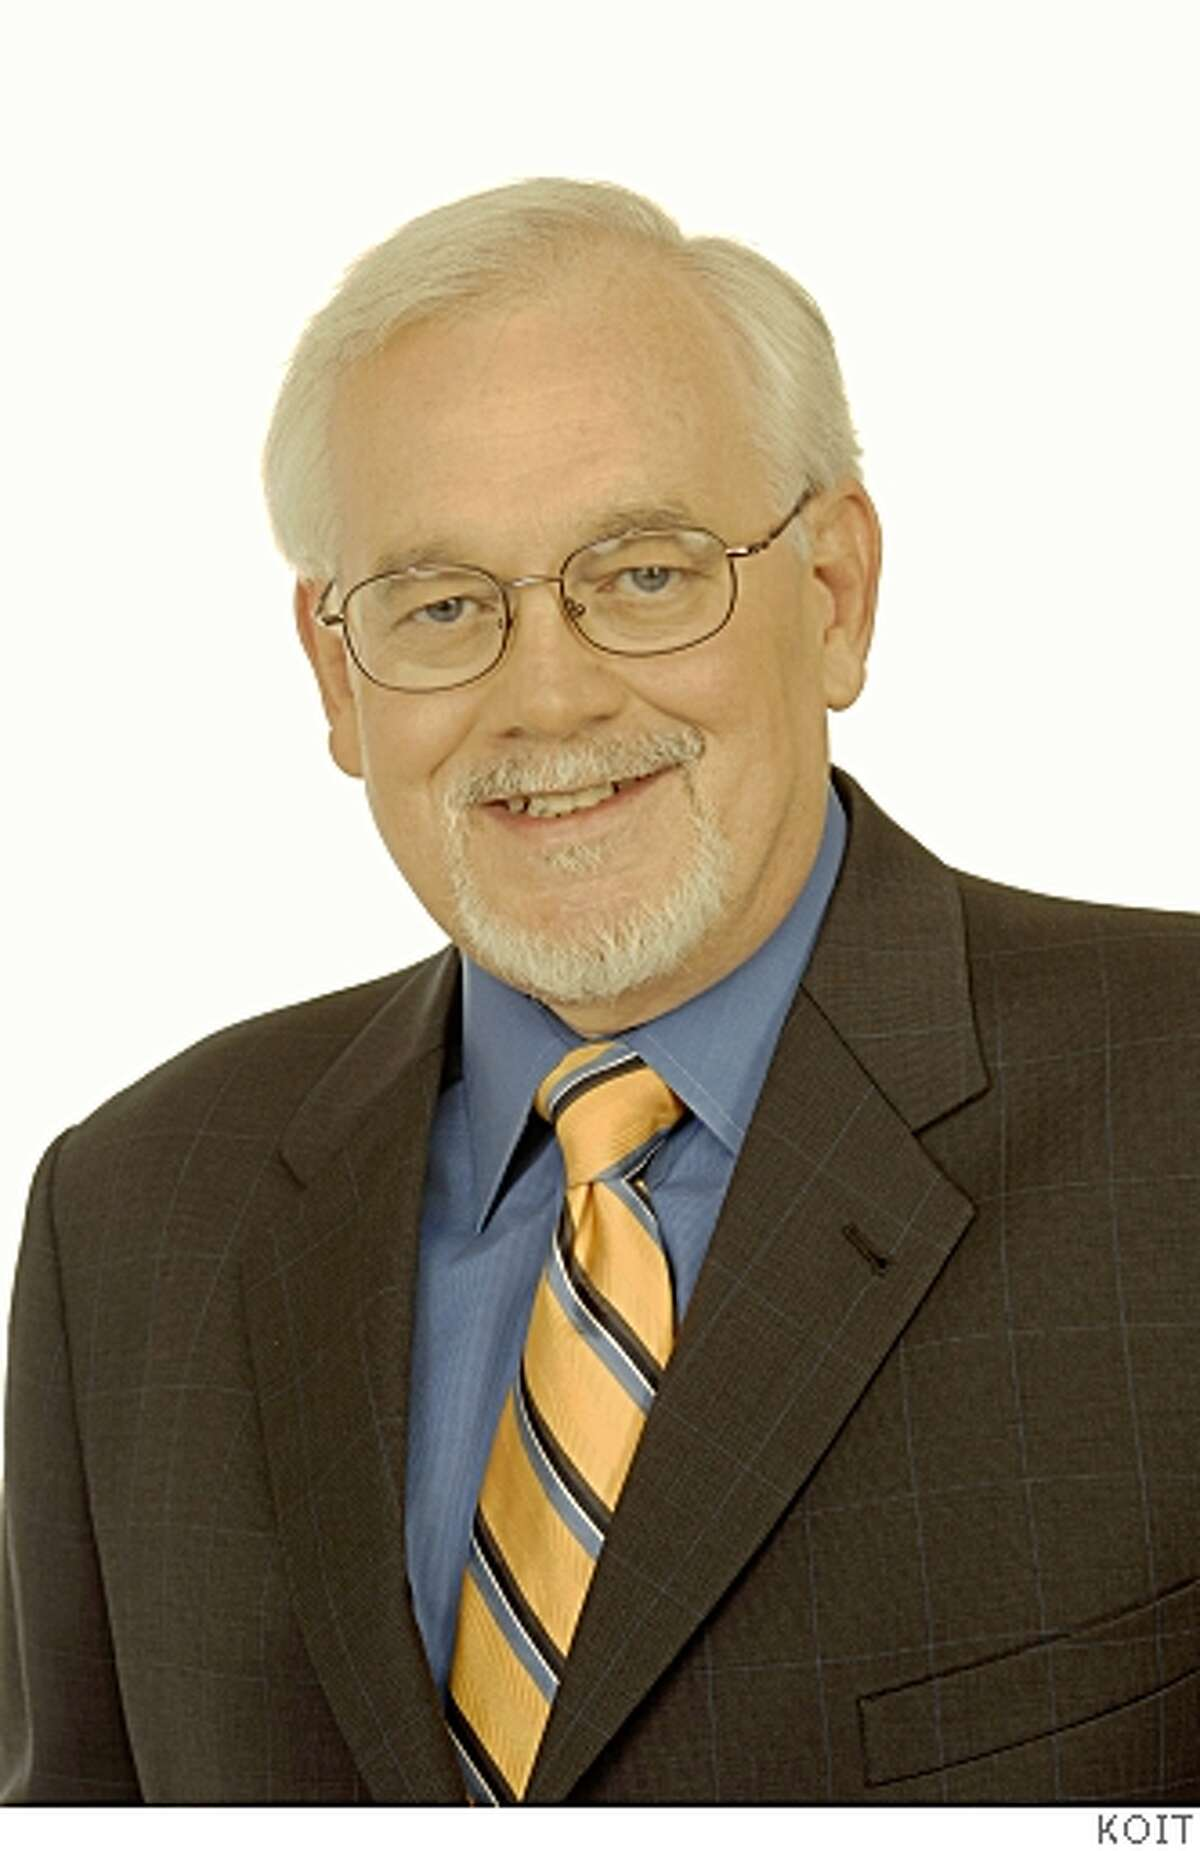 Bill Conway of KOIT, program director